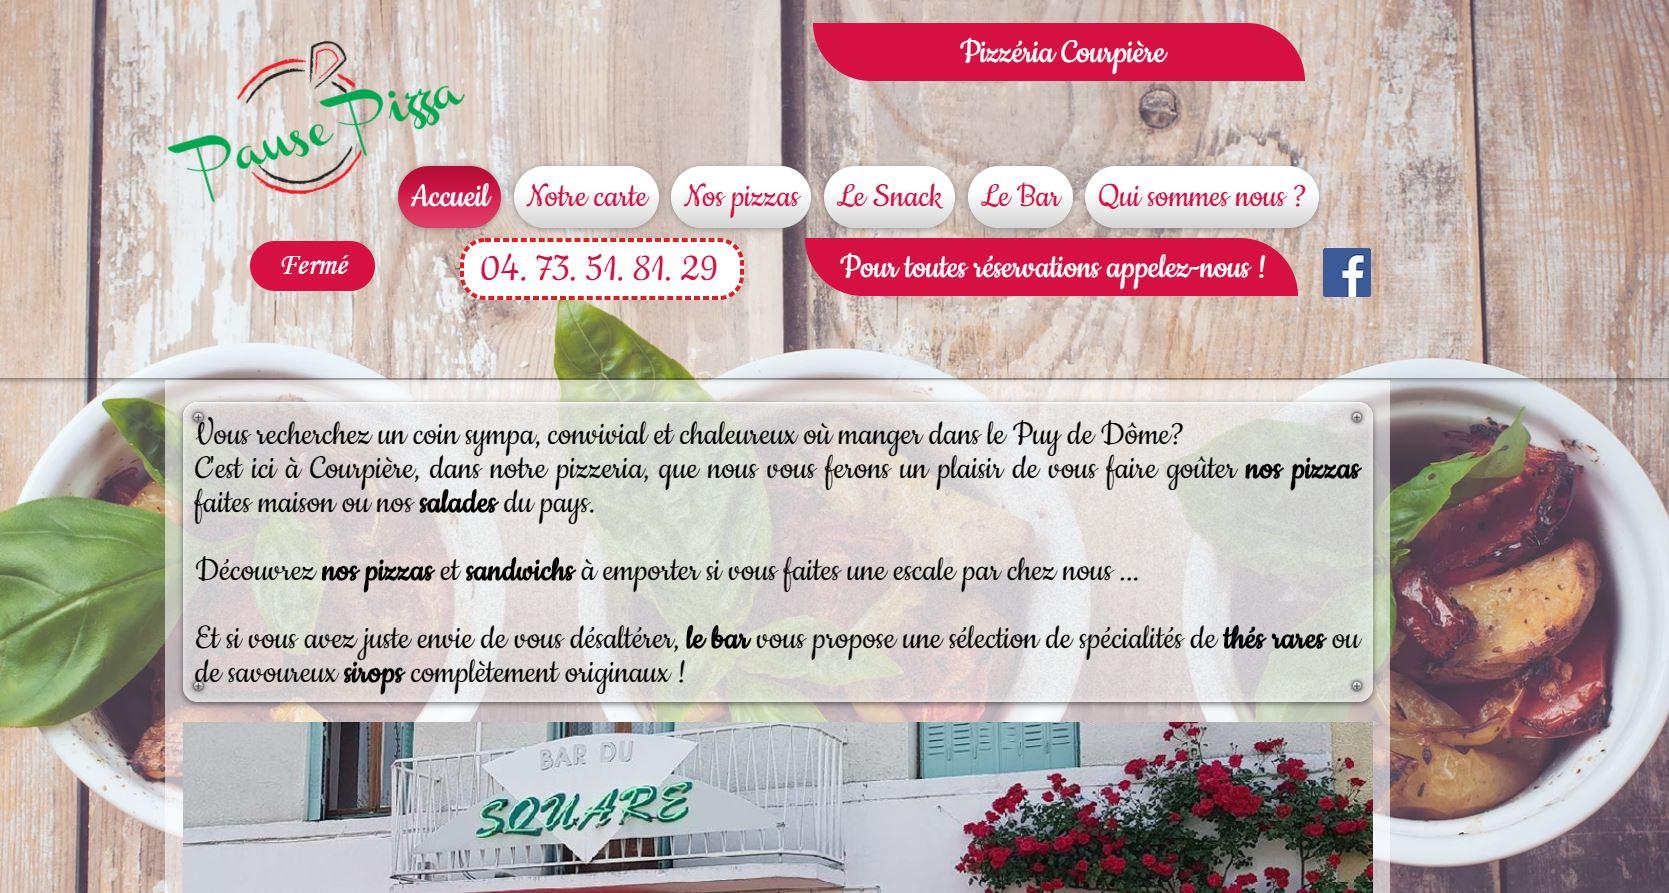 www.pausepizzacourpiere.com